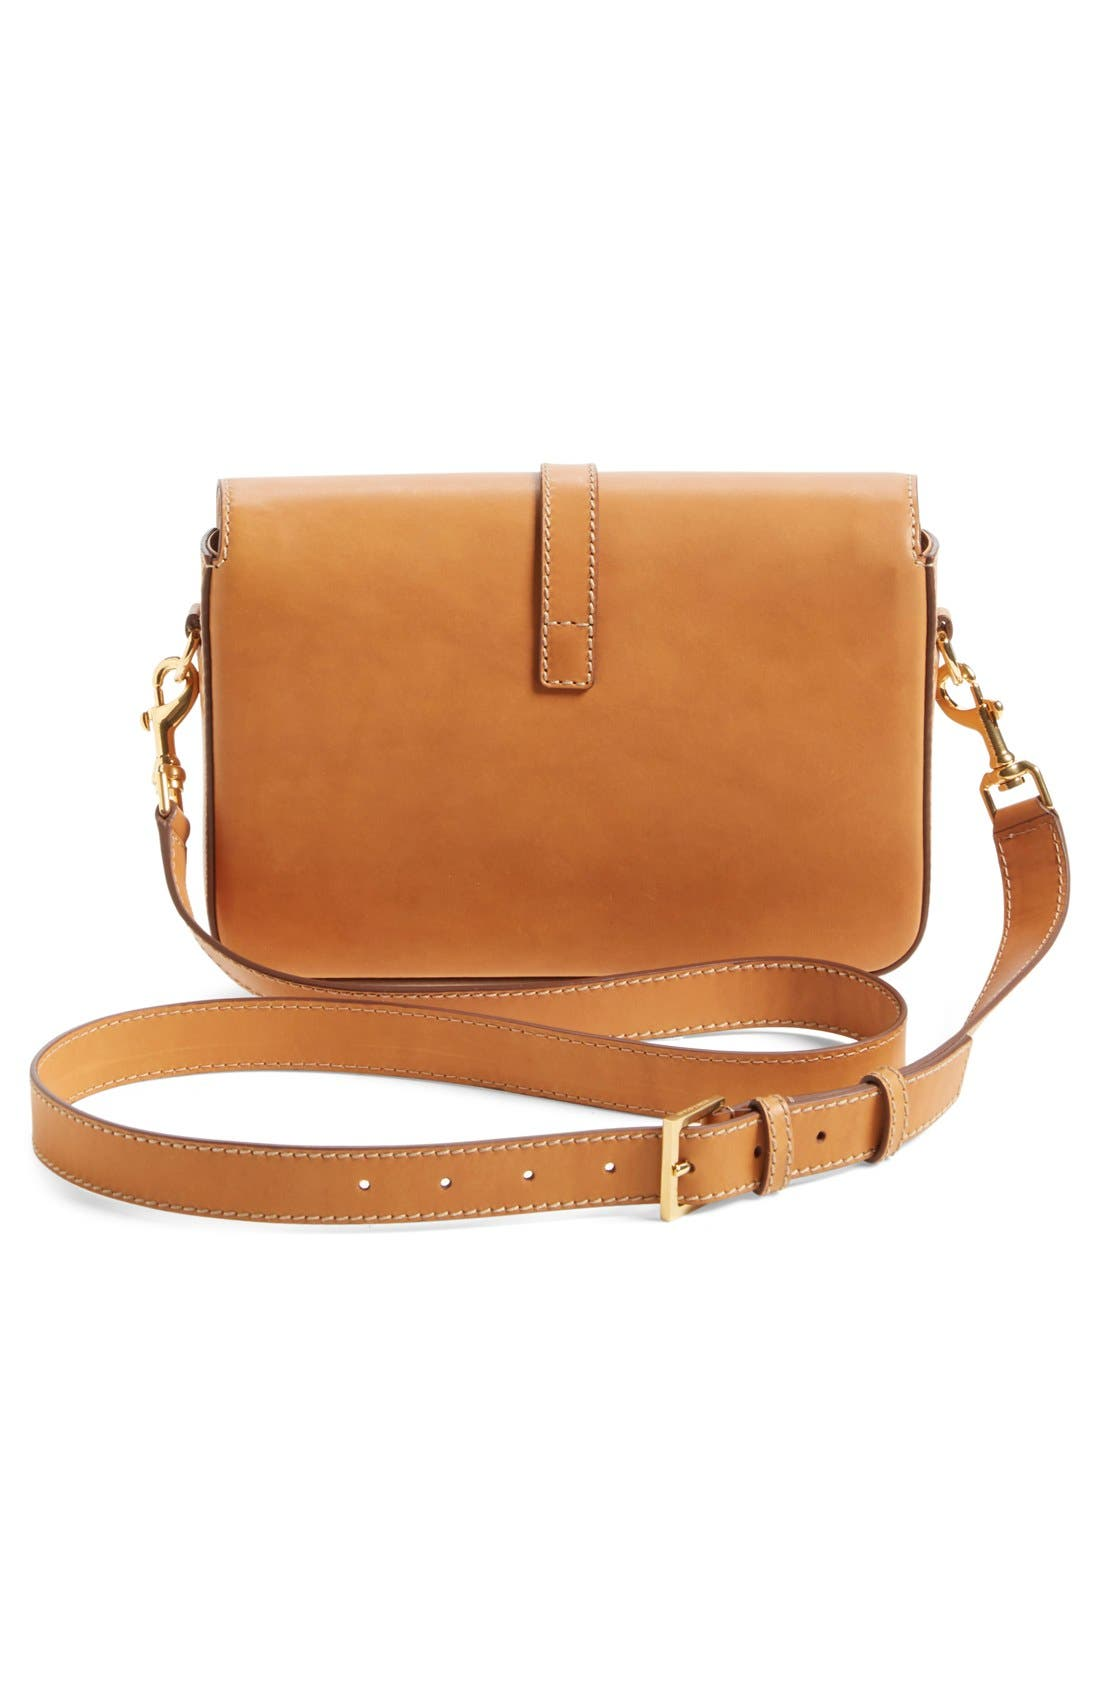 Alternate Image 3  - Saint Laurent 'Medium Monogram' Leather Crossbody Bag